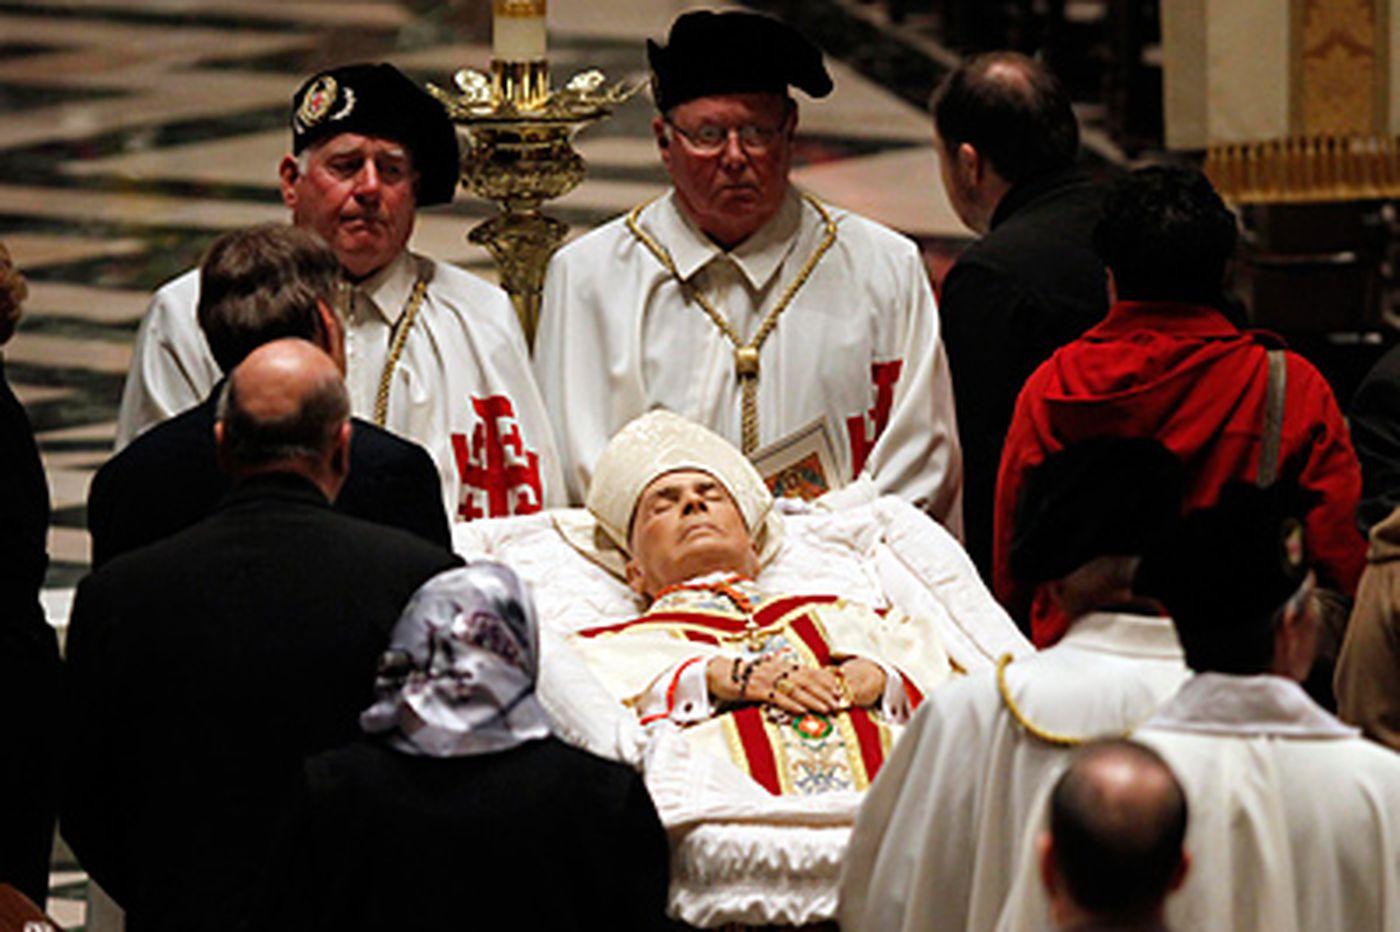 Foley funeral draws church dignitaries